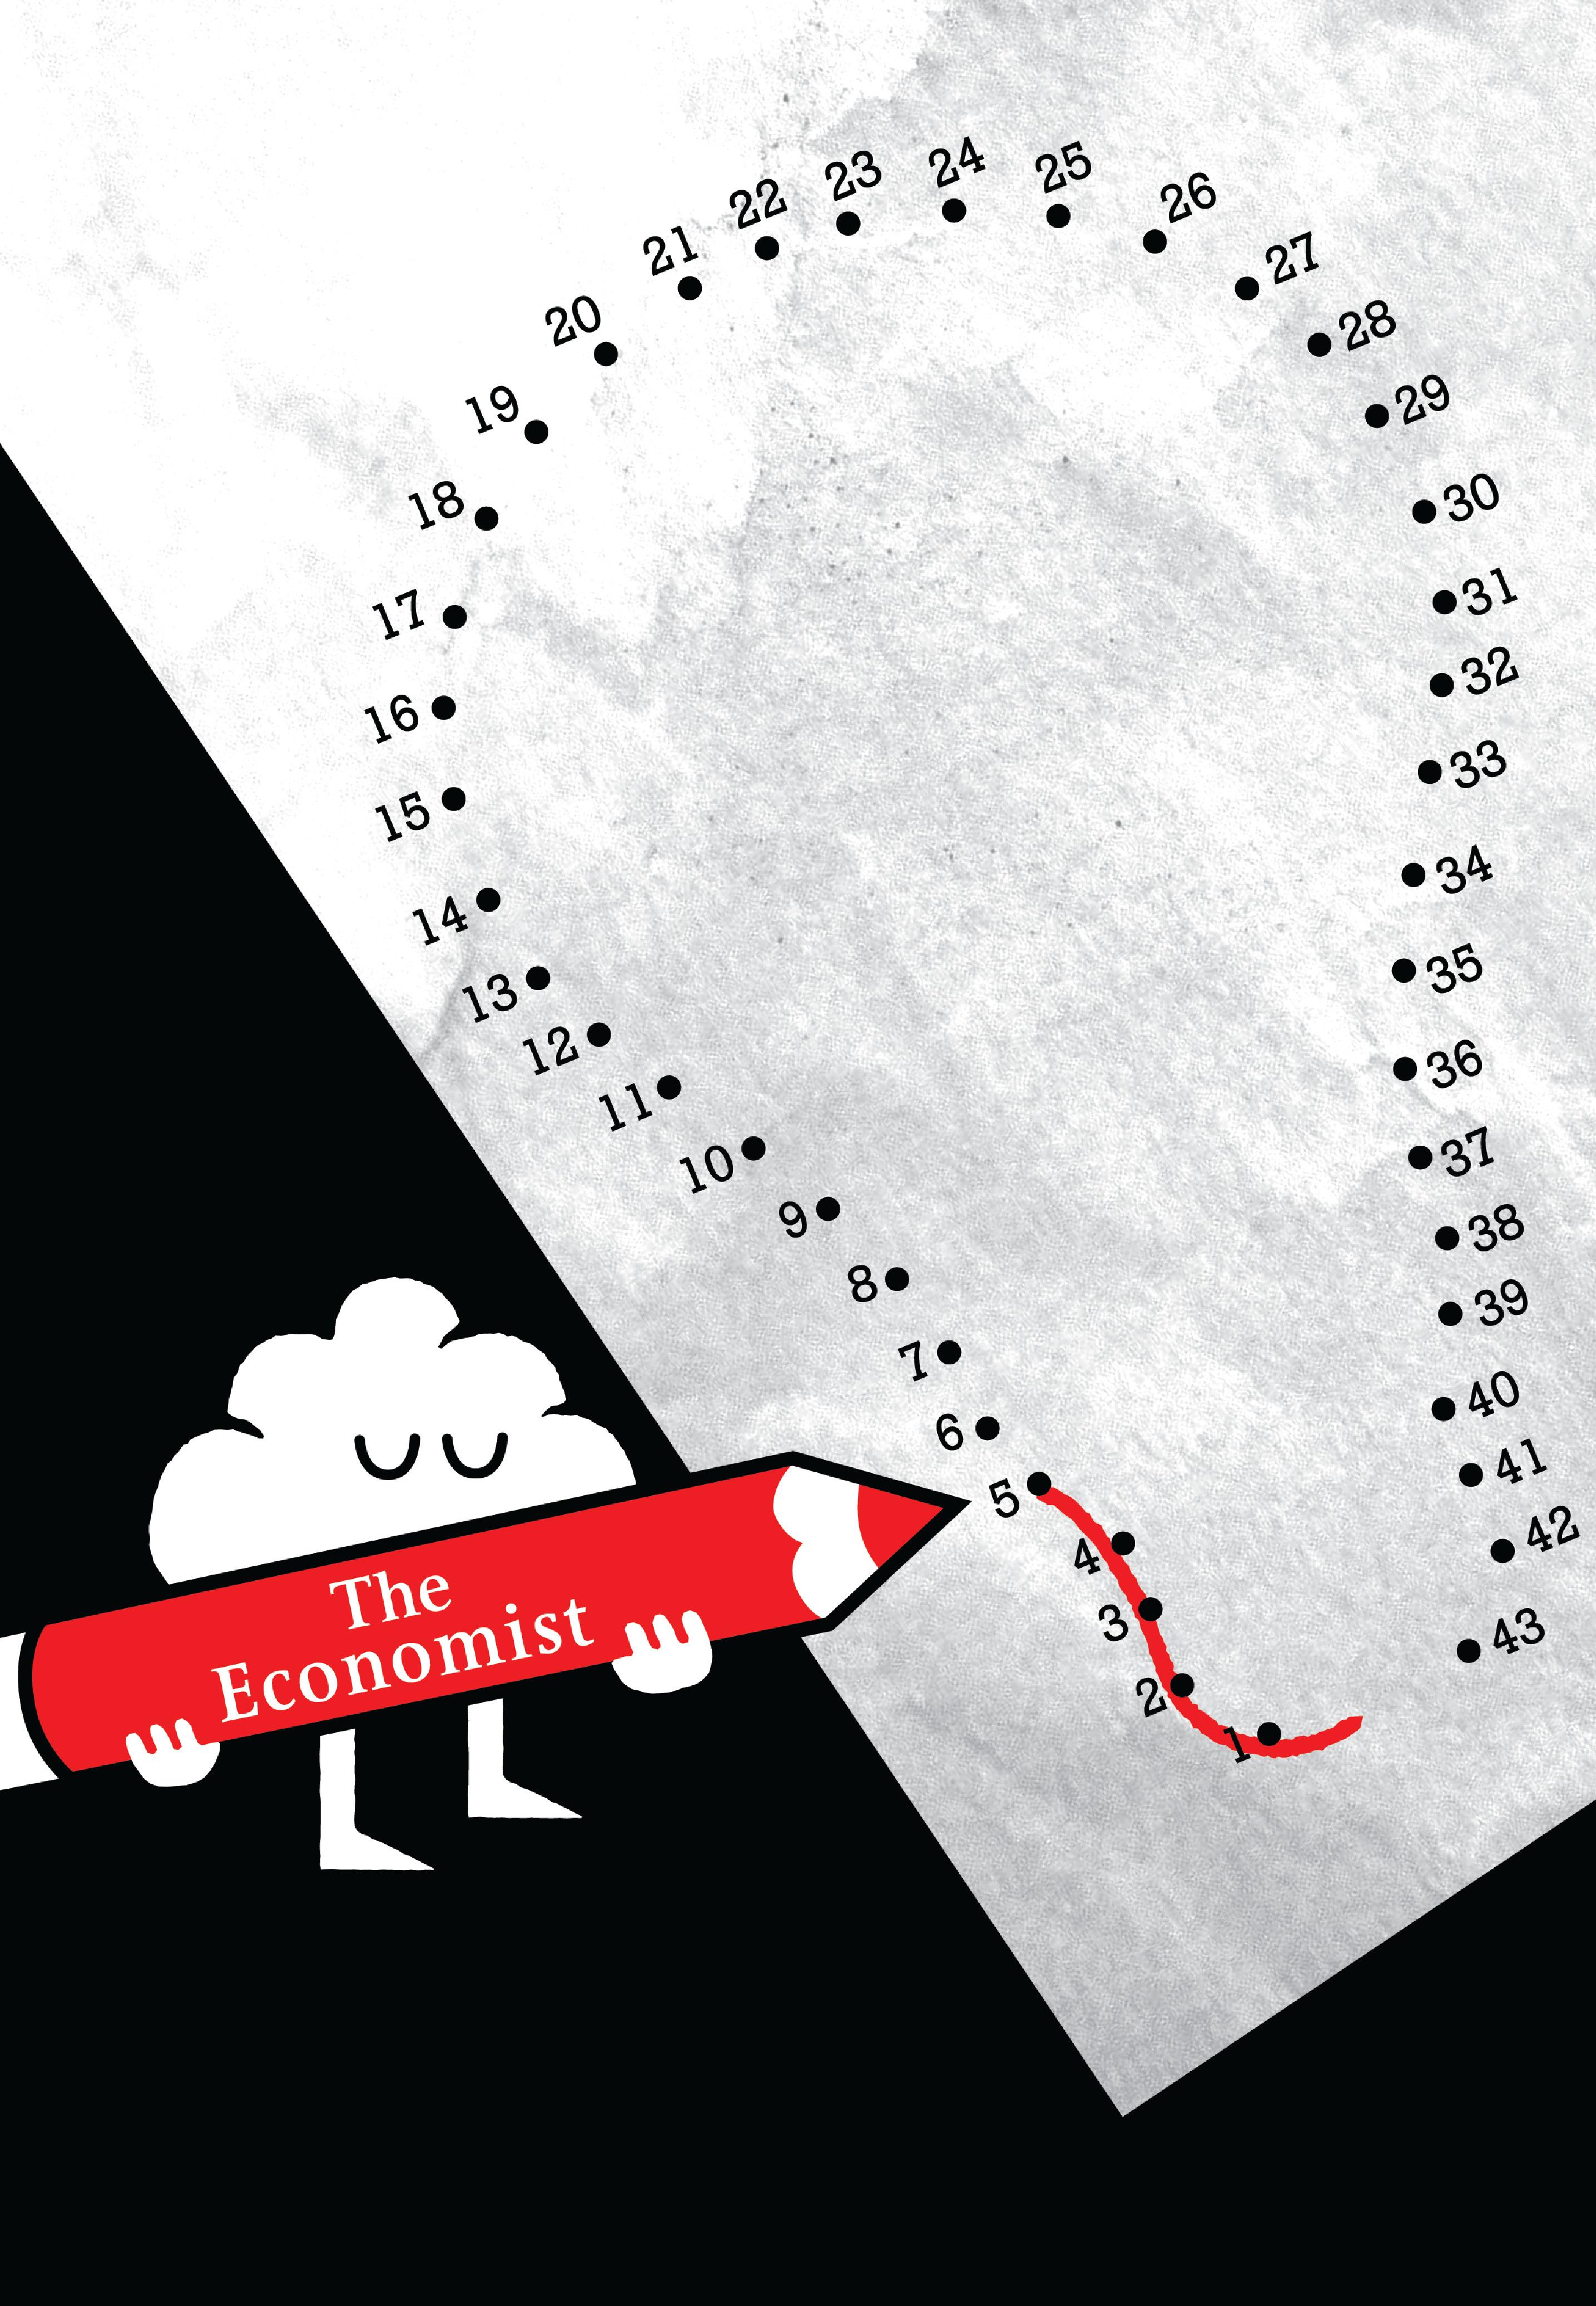 2. 'Dot To Dot' The Economist, DHM.jpg